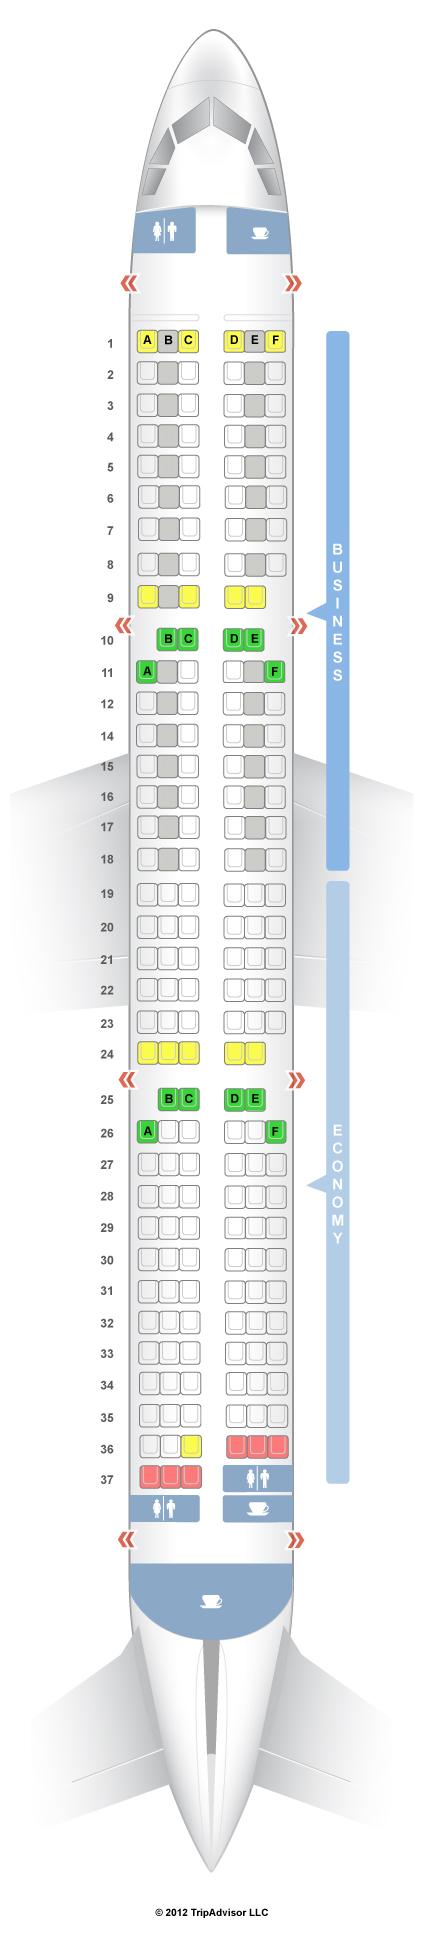 SeatGuru Seat Map SWISS - SeatGuru